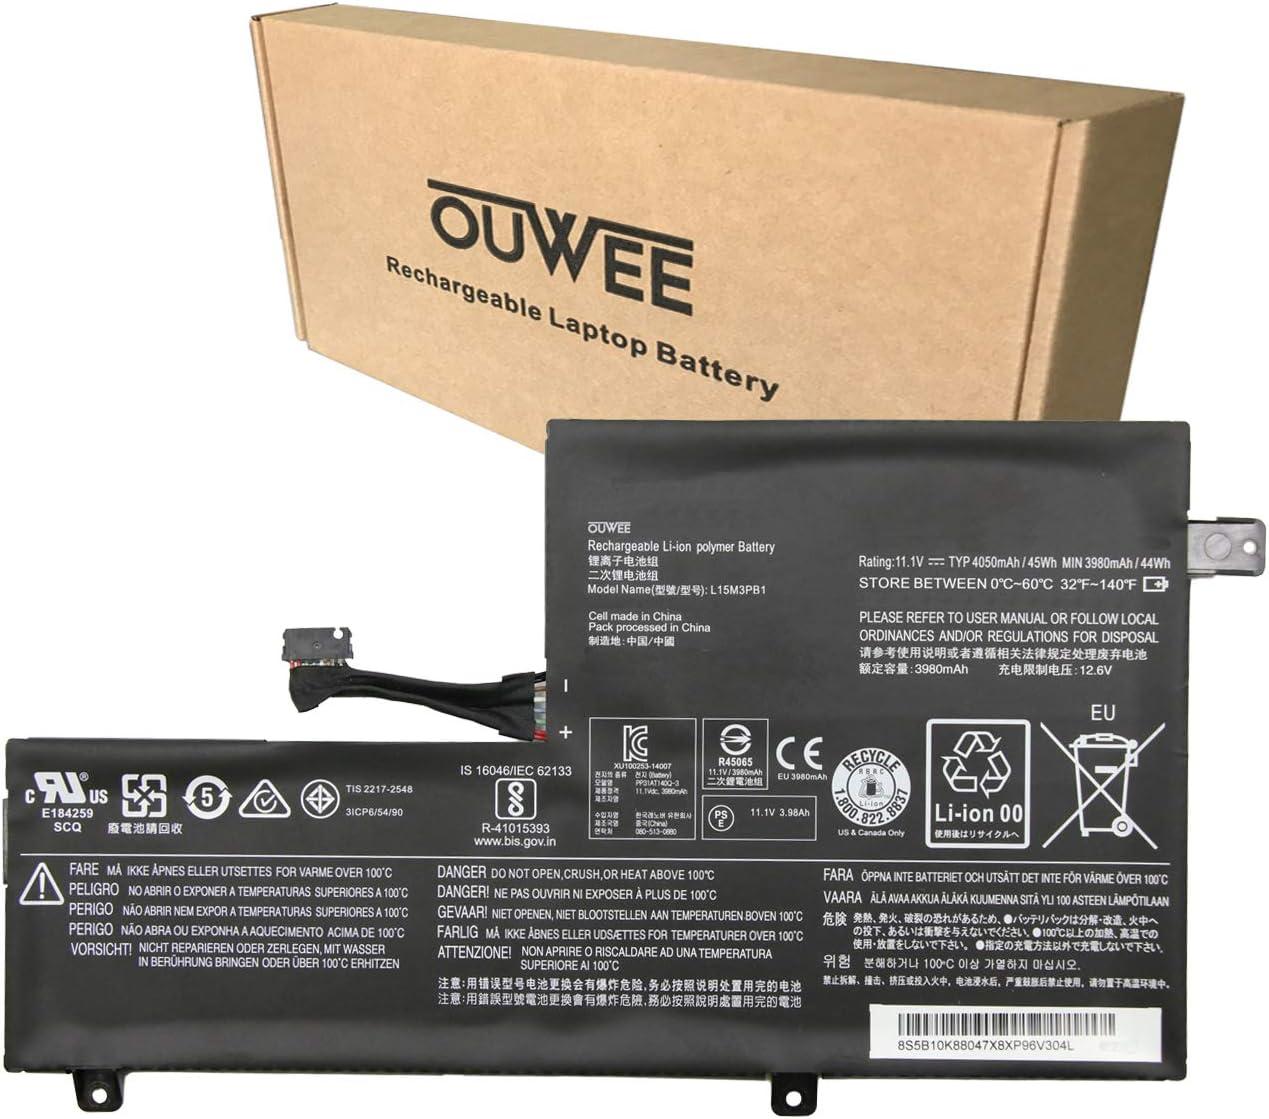 OUWEE L15M3PB1 Laptop Battery Compatible with Lenovo Flex 11 Chromebook S330 C330 N22 N22-20 N23 N42 N42-20 300E Chromebook Series 5B10K88047 5B10K88048 L15L3PB1 5B10K88049 SB18C15129 11.1V 45Wh